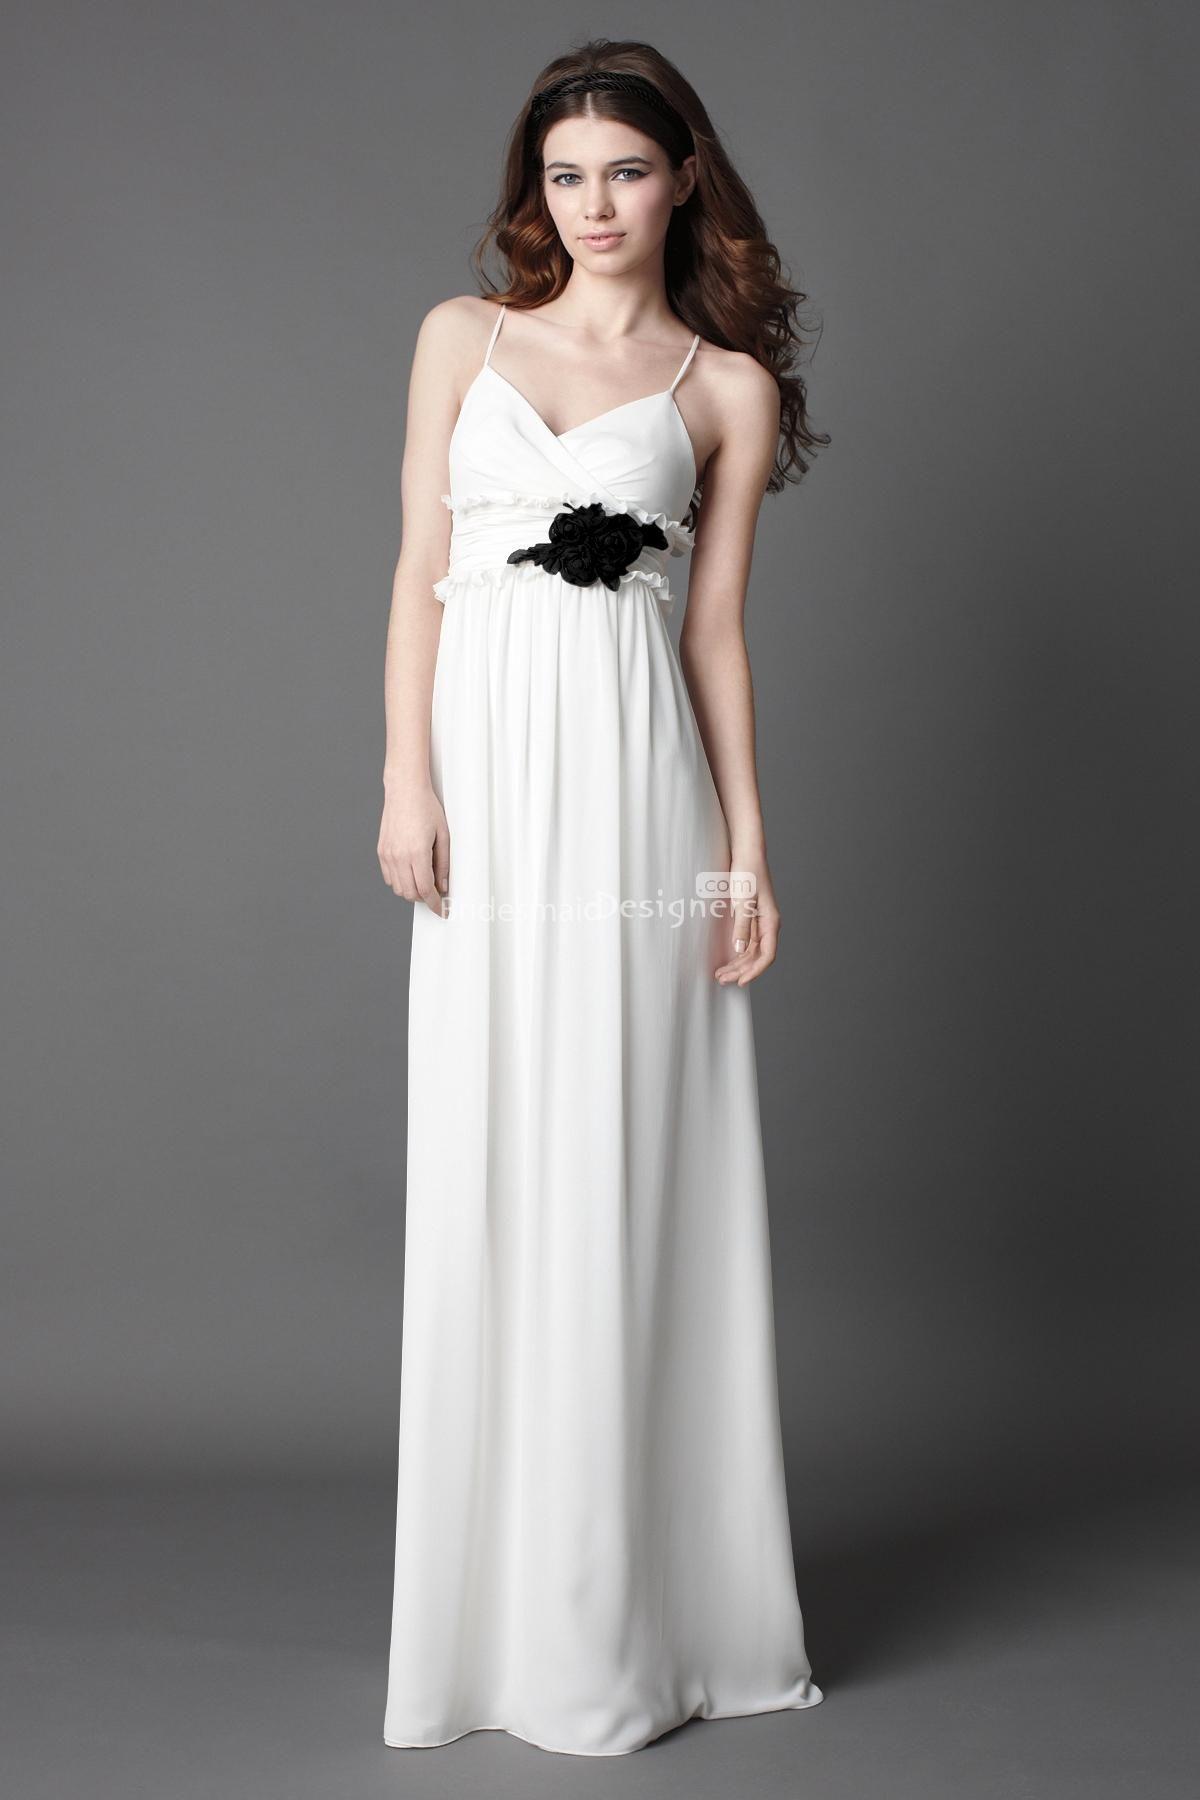 Images of Formal Floor Length Dresses - Reikian